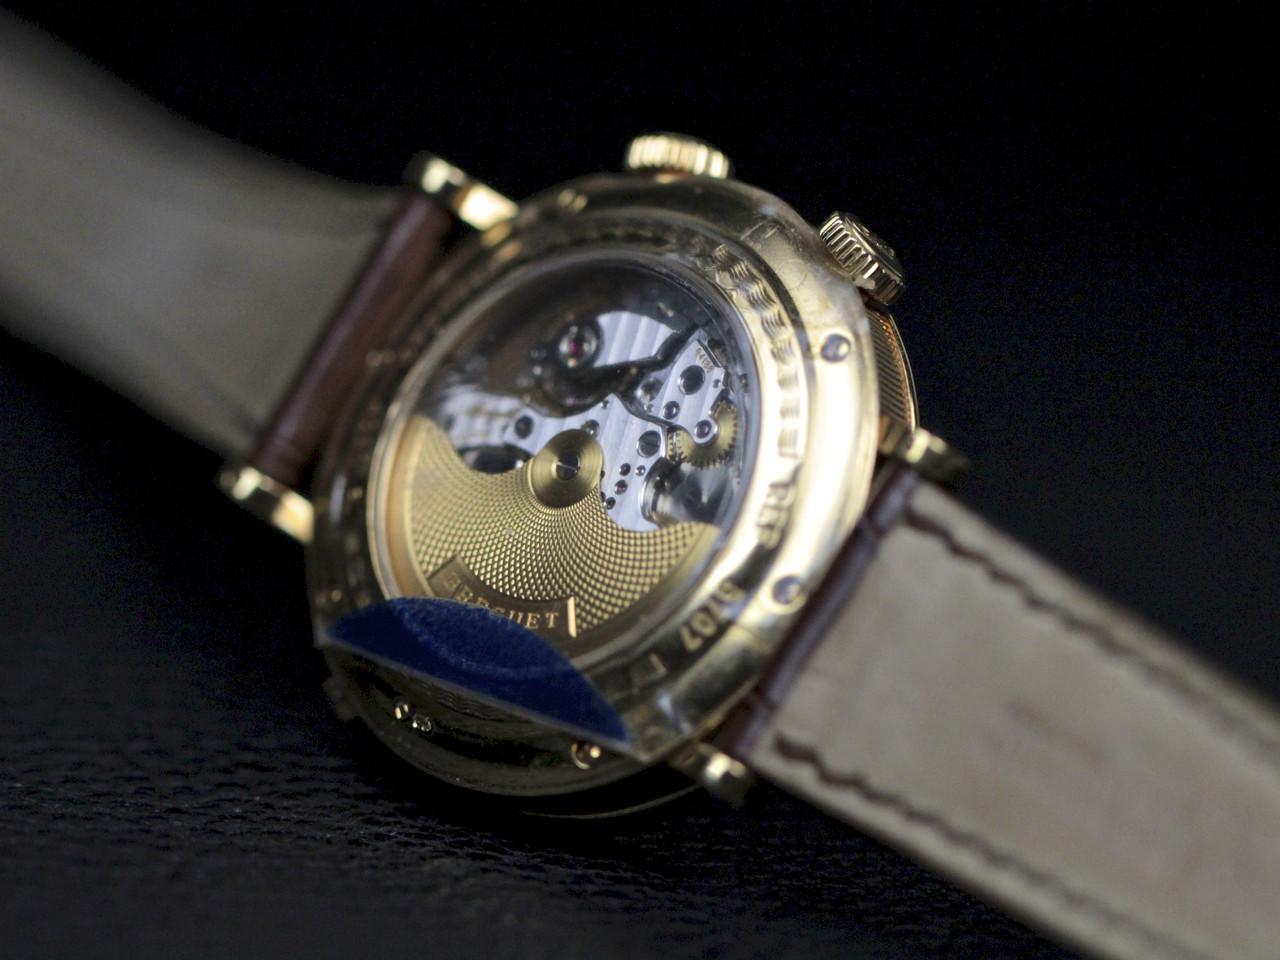 Exhibition Case Back - Breguet Watch - Classique GMT Alarm Yellow Gold 5707.BA.12.9V6 - www.Legendoftime.com - Chicago Watch Center